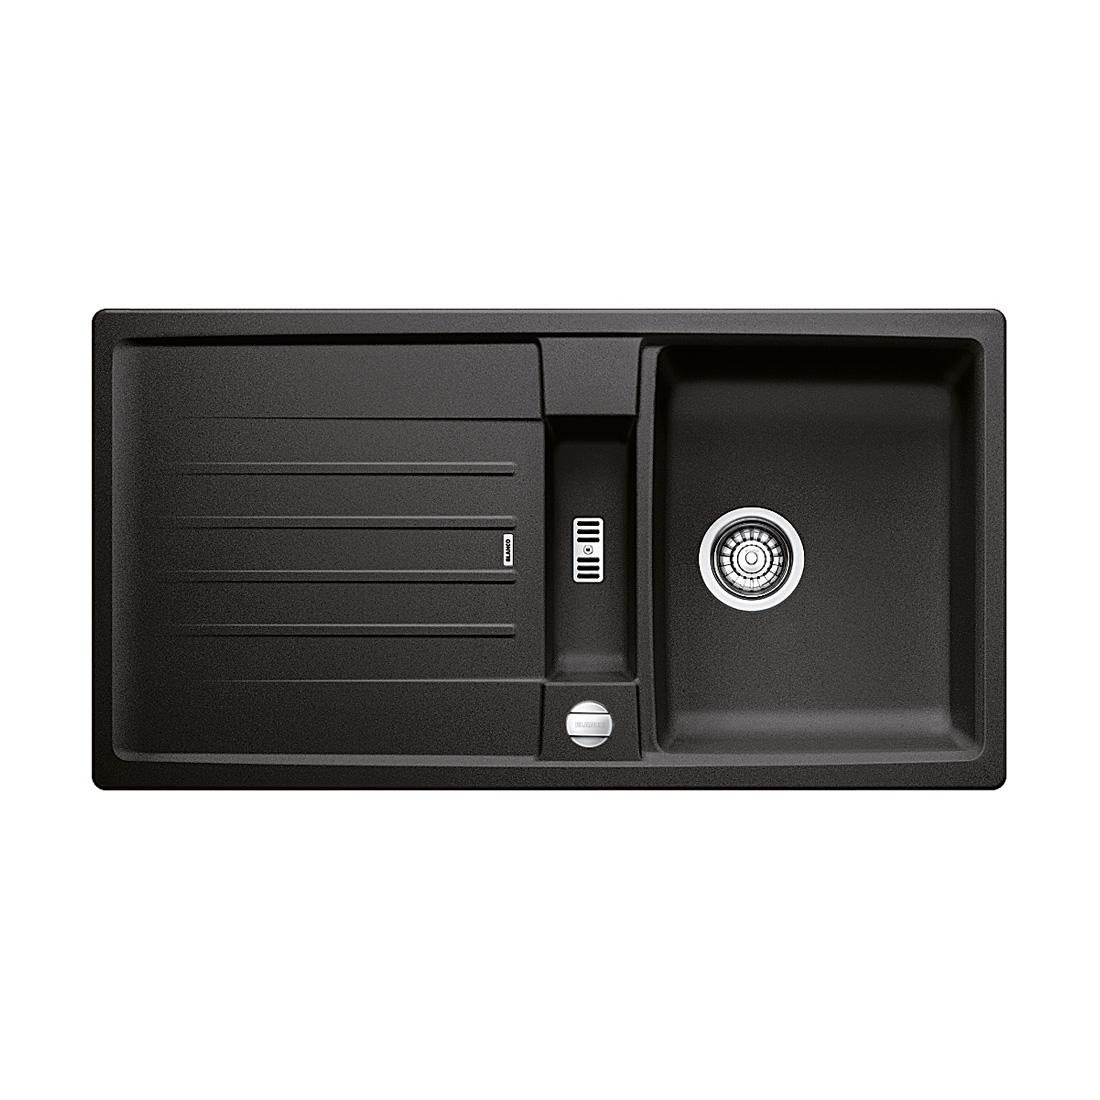 blanco lexa 5 s sp le b 95 t 50 cm becken silgranit puradur ii anthrazit 518641 reuter. Black Bedroom Furniture Sets. Home Design Ideas